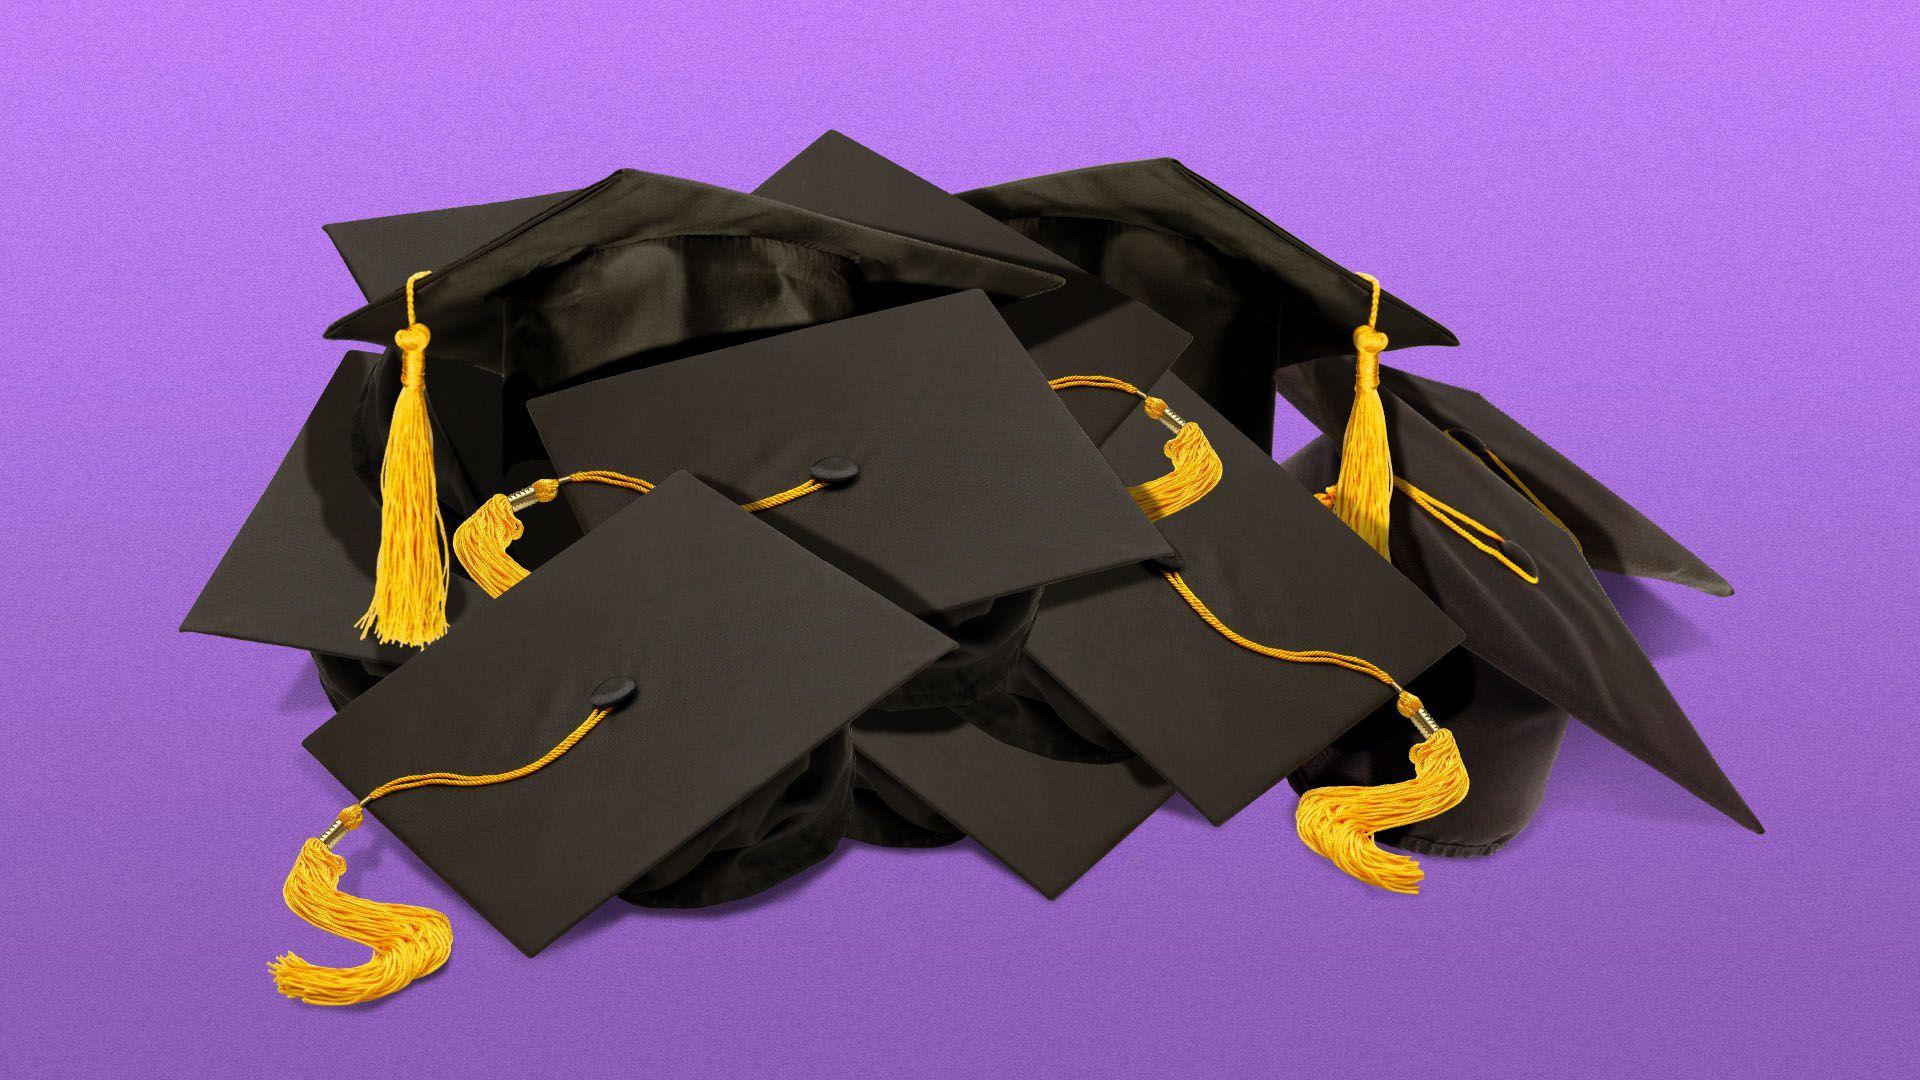 Illustration of a pile of graduation caps